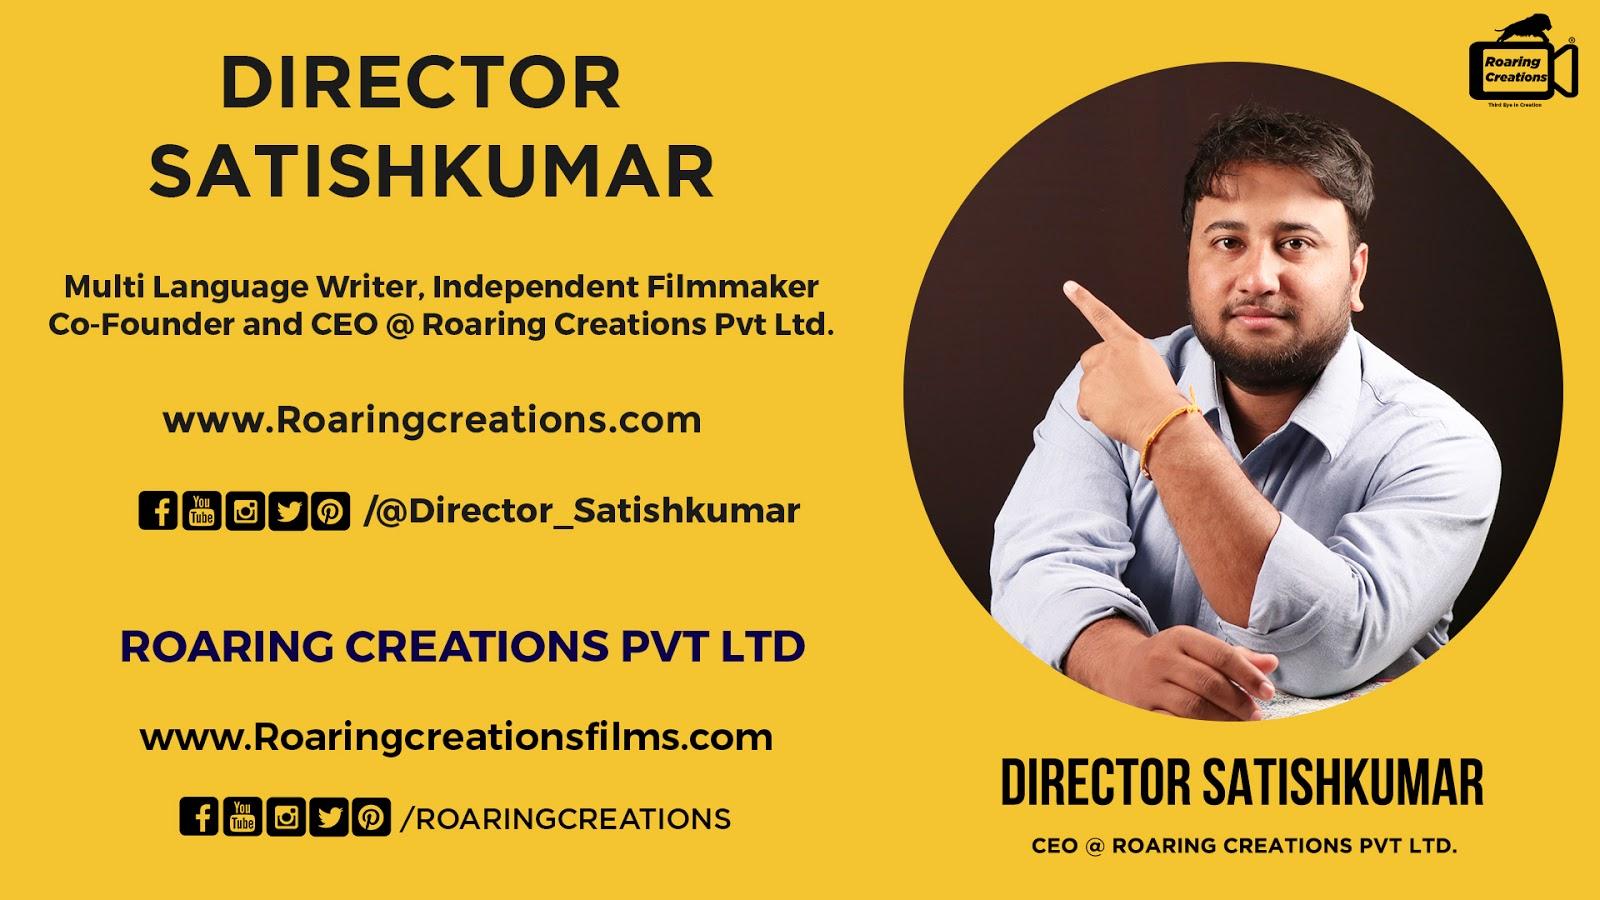 About Director Satishkumar